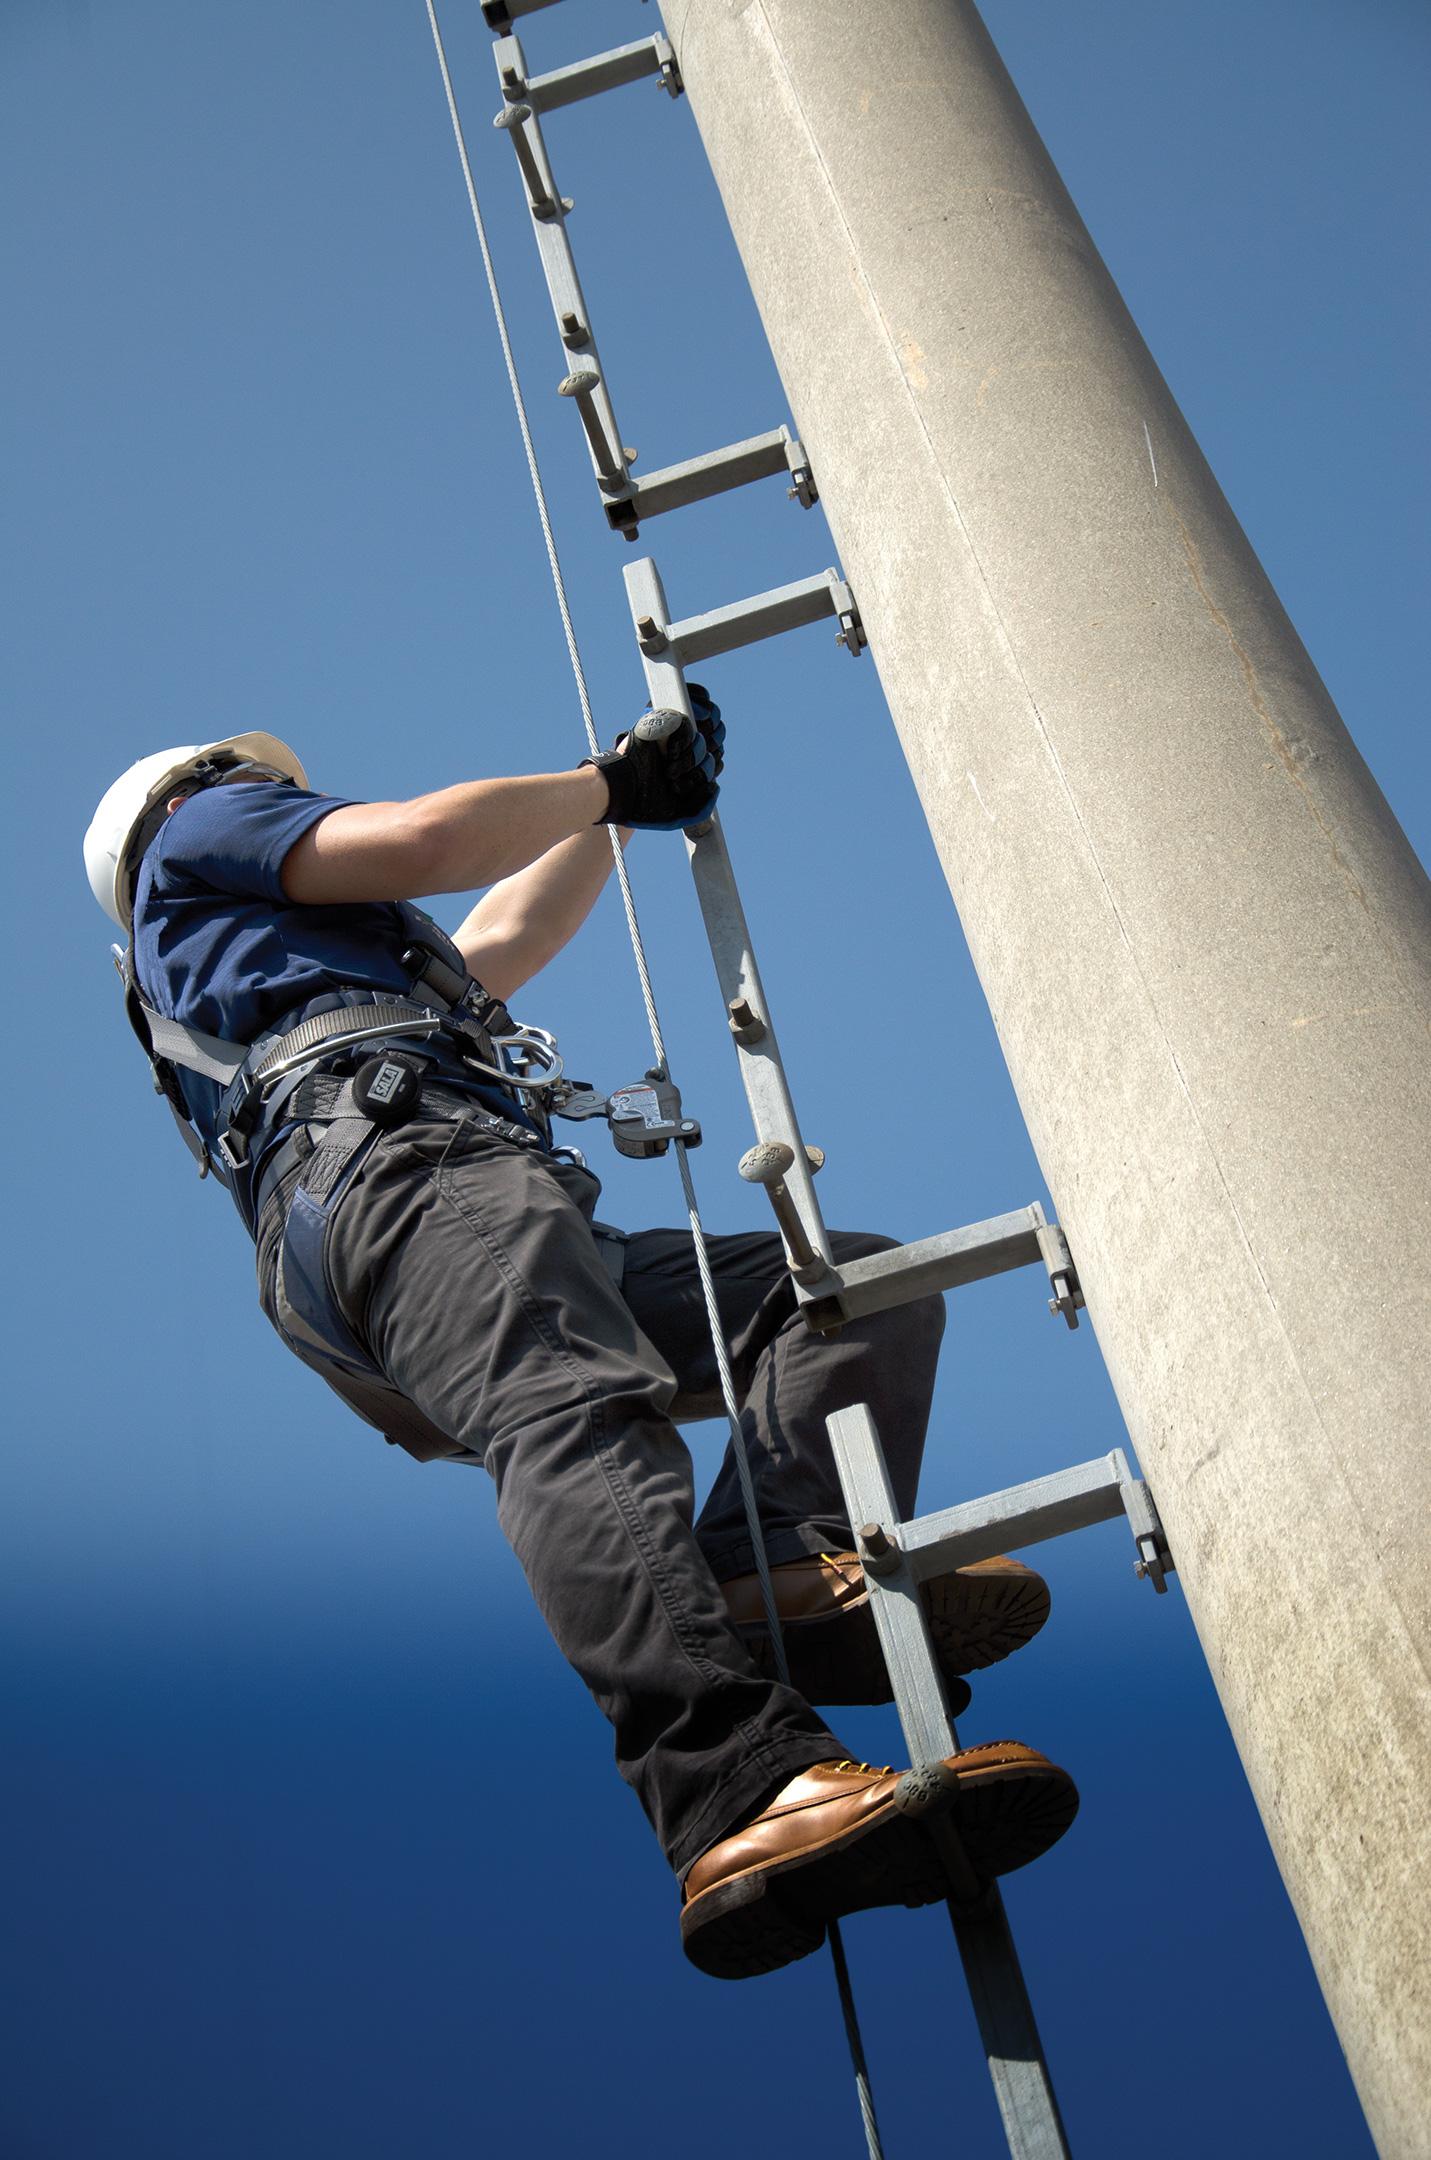 Vertical Lifeline Systems